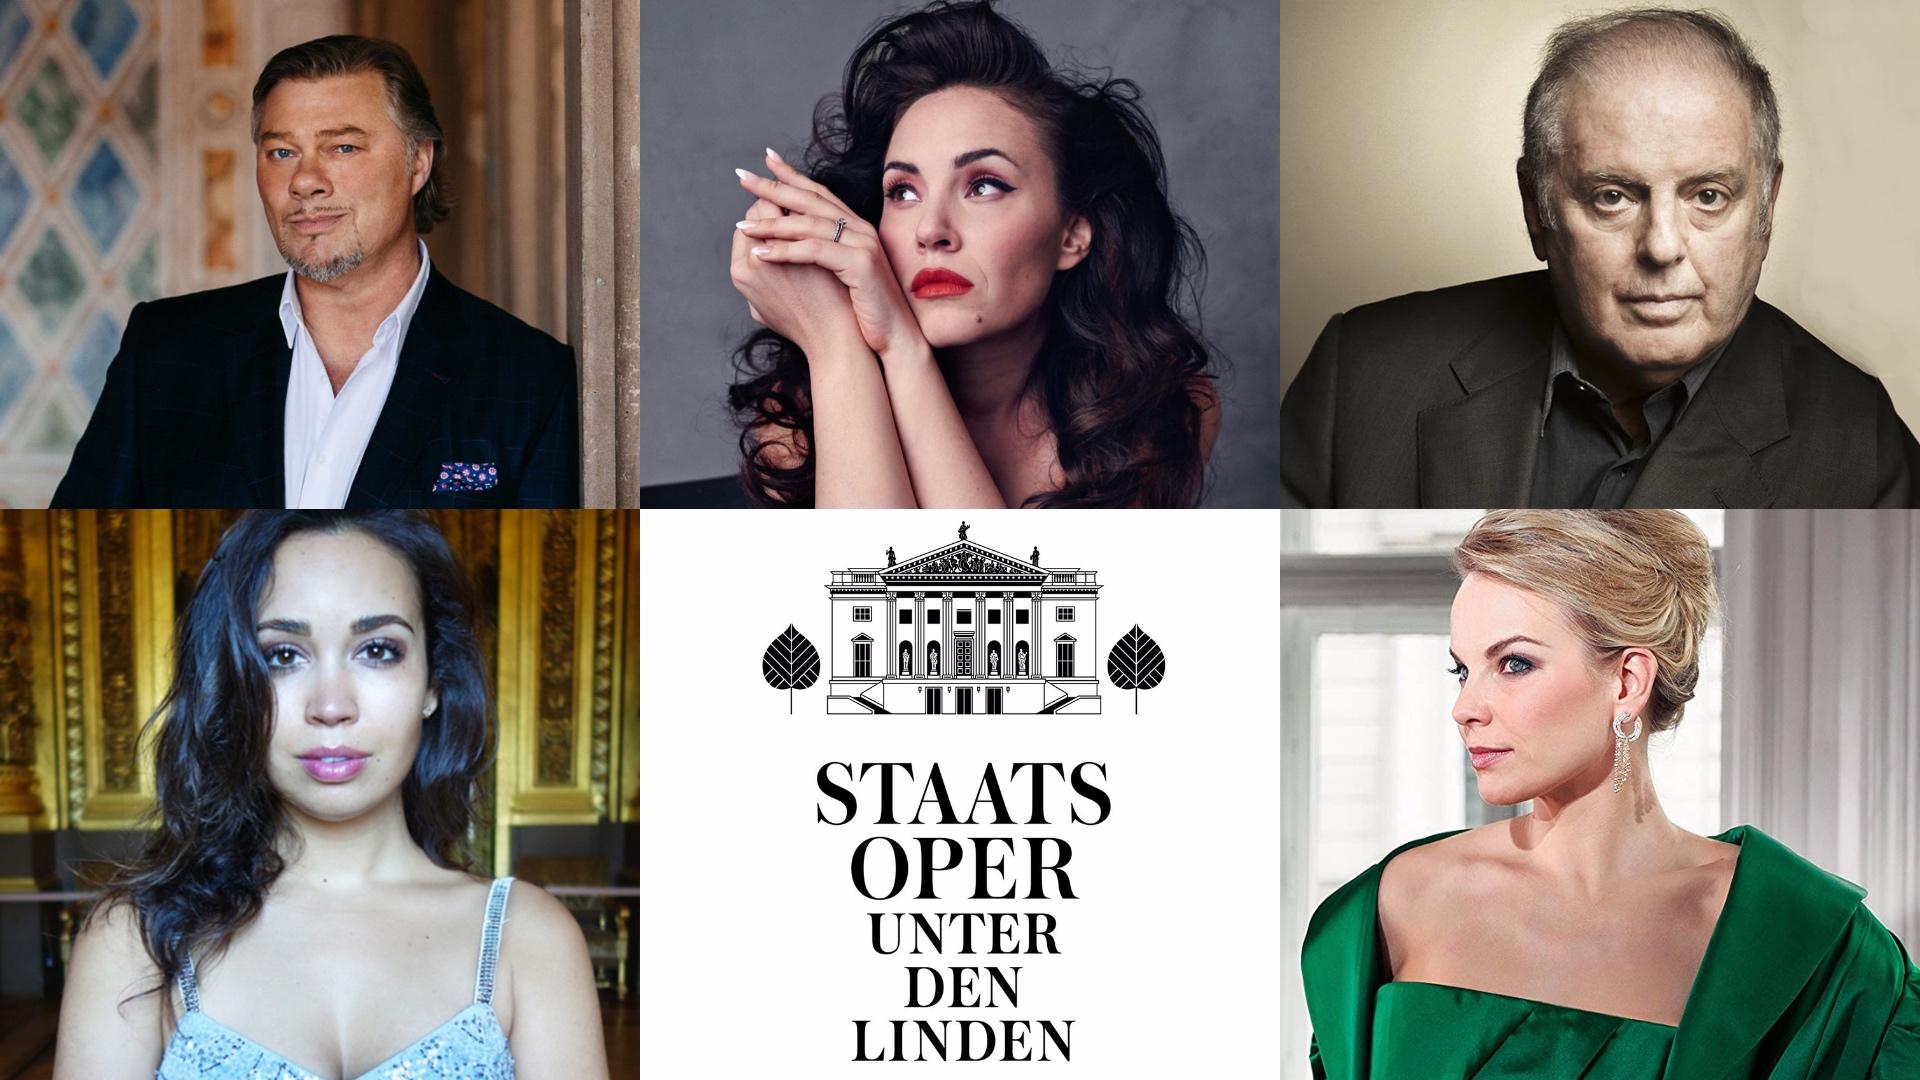 Daniel Barenboim; René Pape; Sonya Yoncheva; Nadine Sierra Elina Garanca; Staatsoper Berlin; Berlino; Staatsoper Unter den Linden; StaatsoperBLN1920